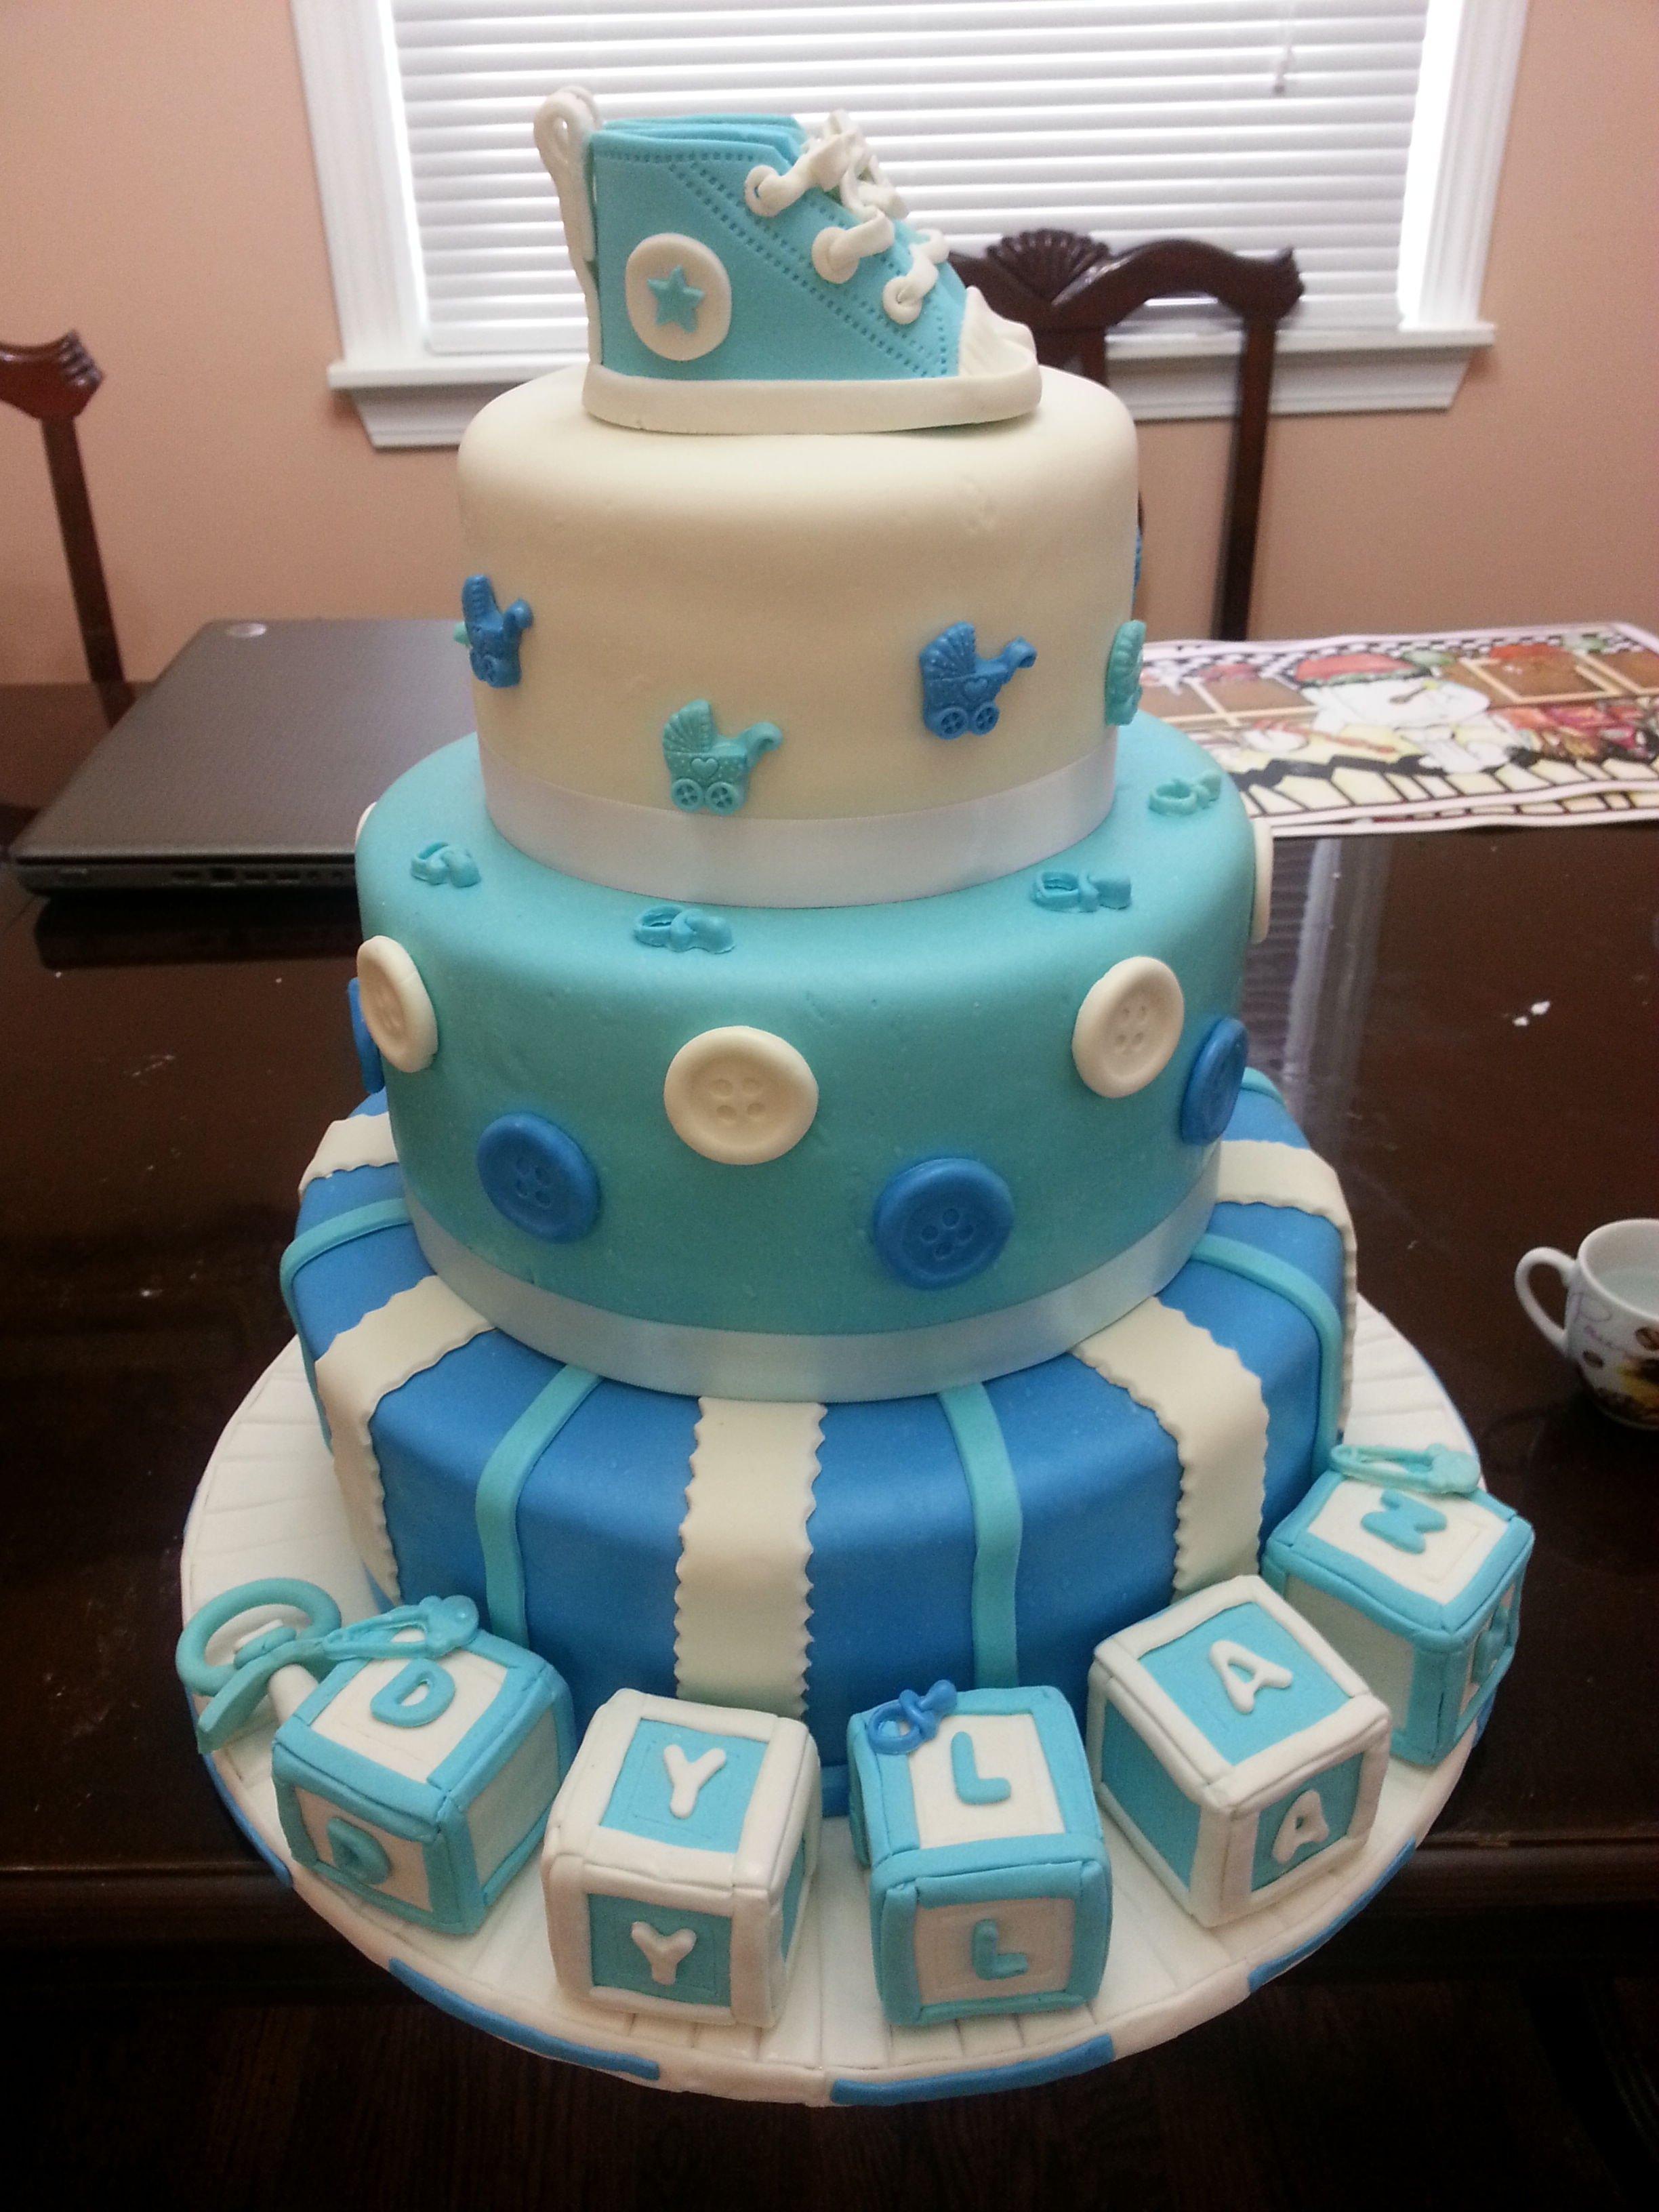 10 Stunning Baby Boy Baby Shower Cake Ideas baby shower baby shower cakes boys pinterest babies cake 2 2020